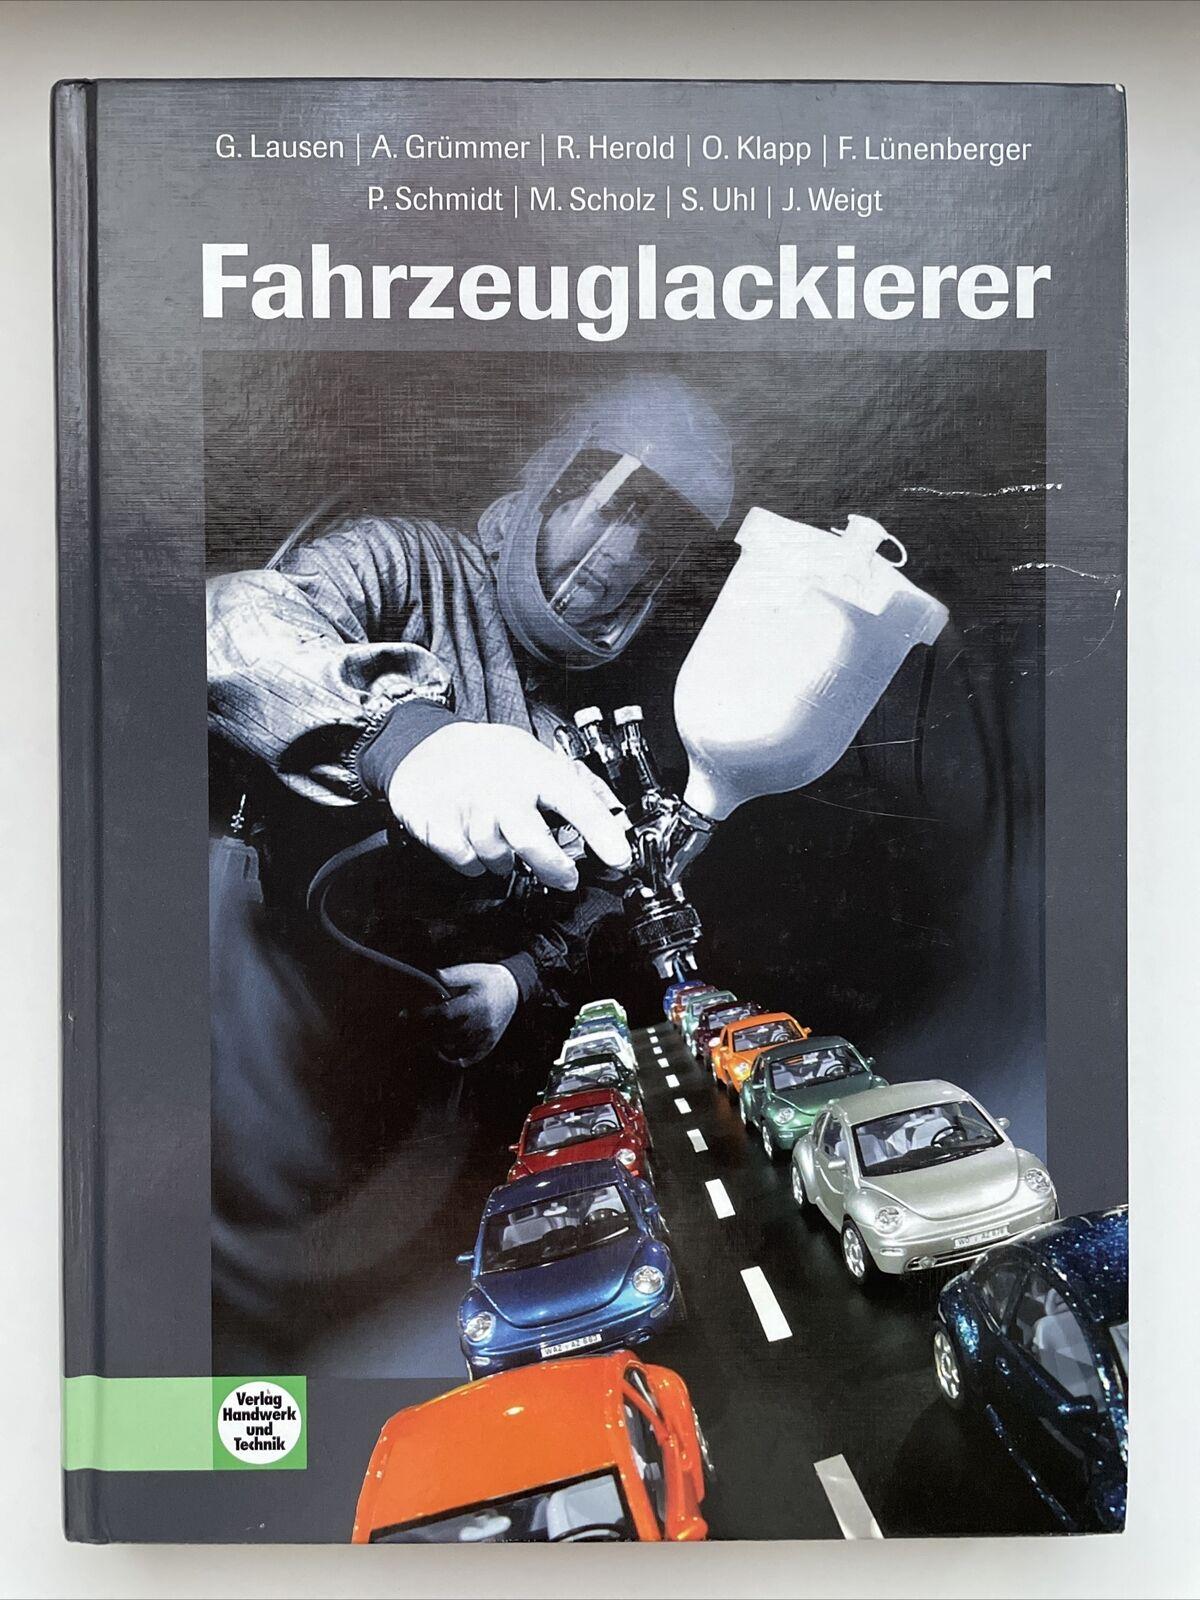 Fahrzeuglackierer - Gerd Lausen